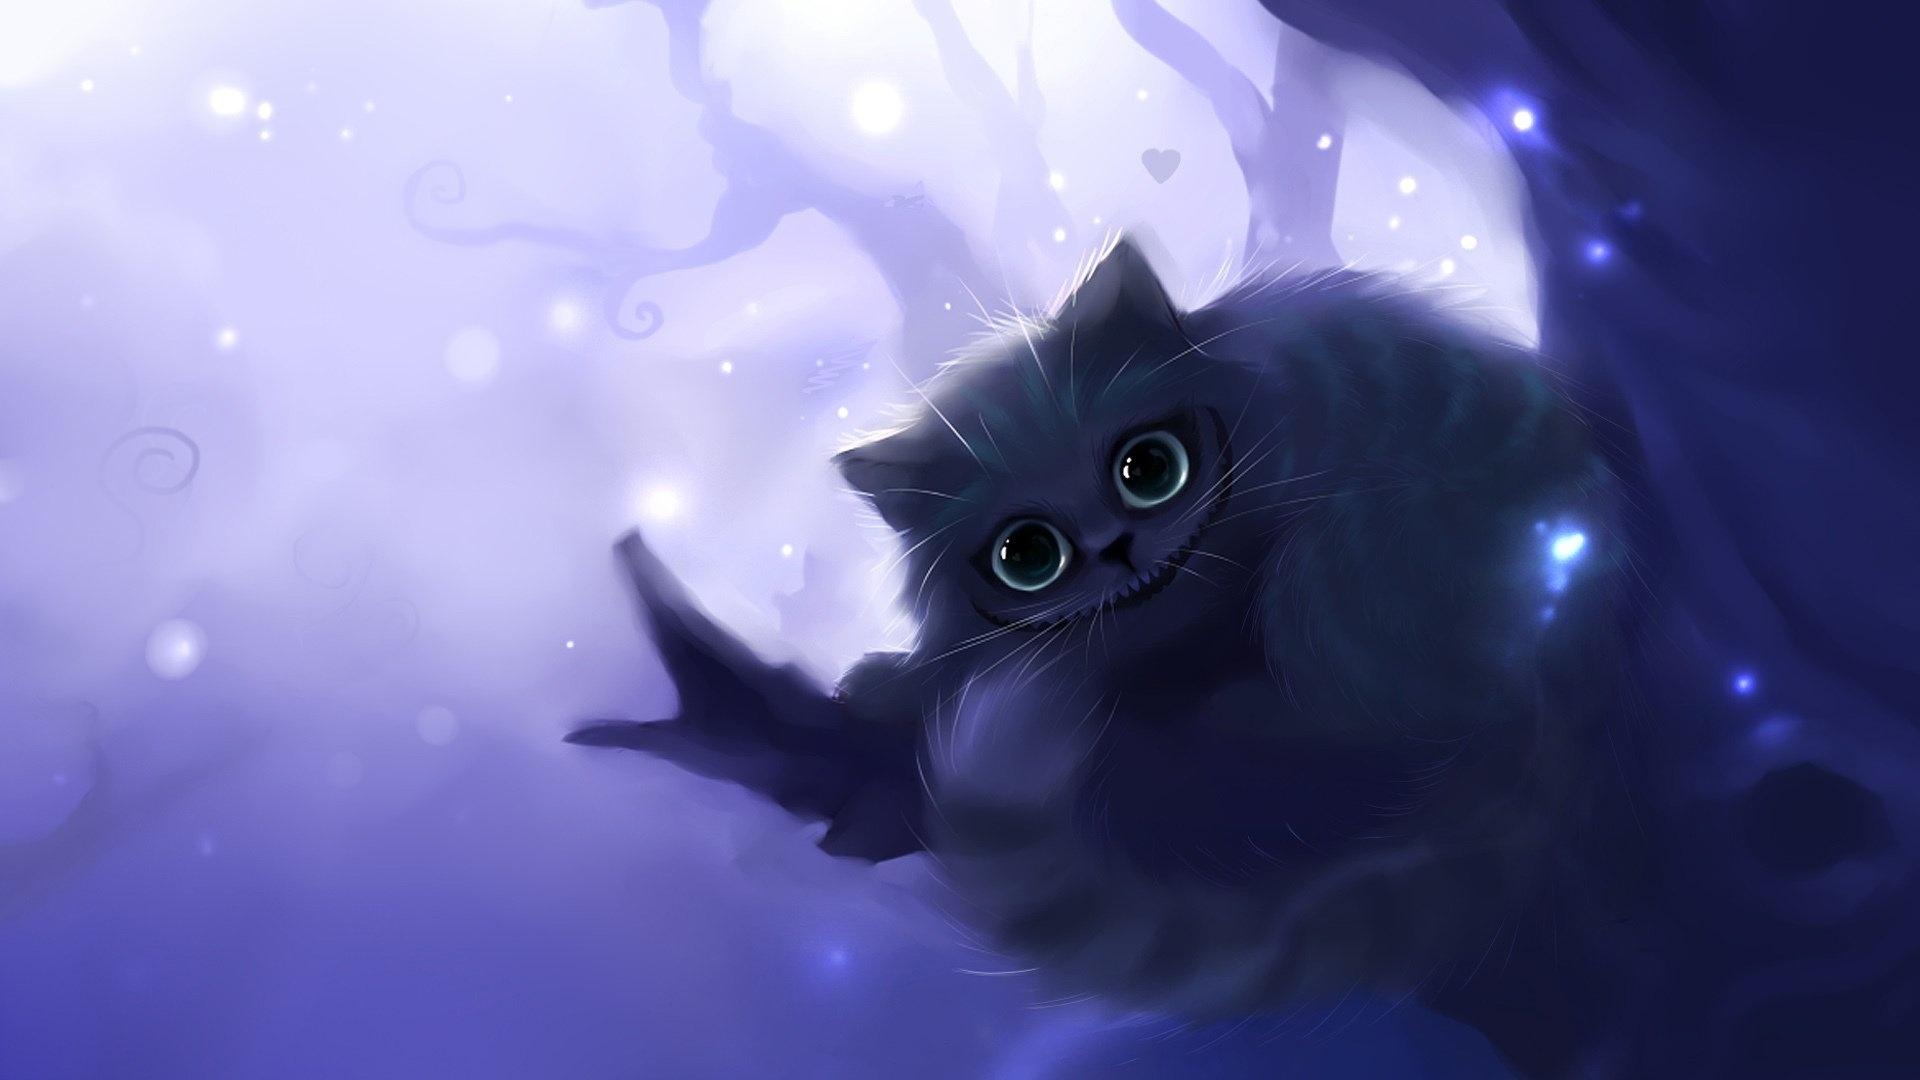 Drawn Cats wallpaper for desktop